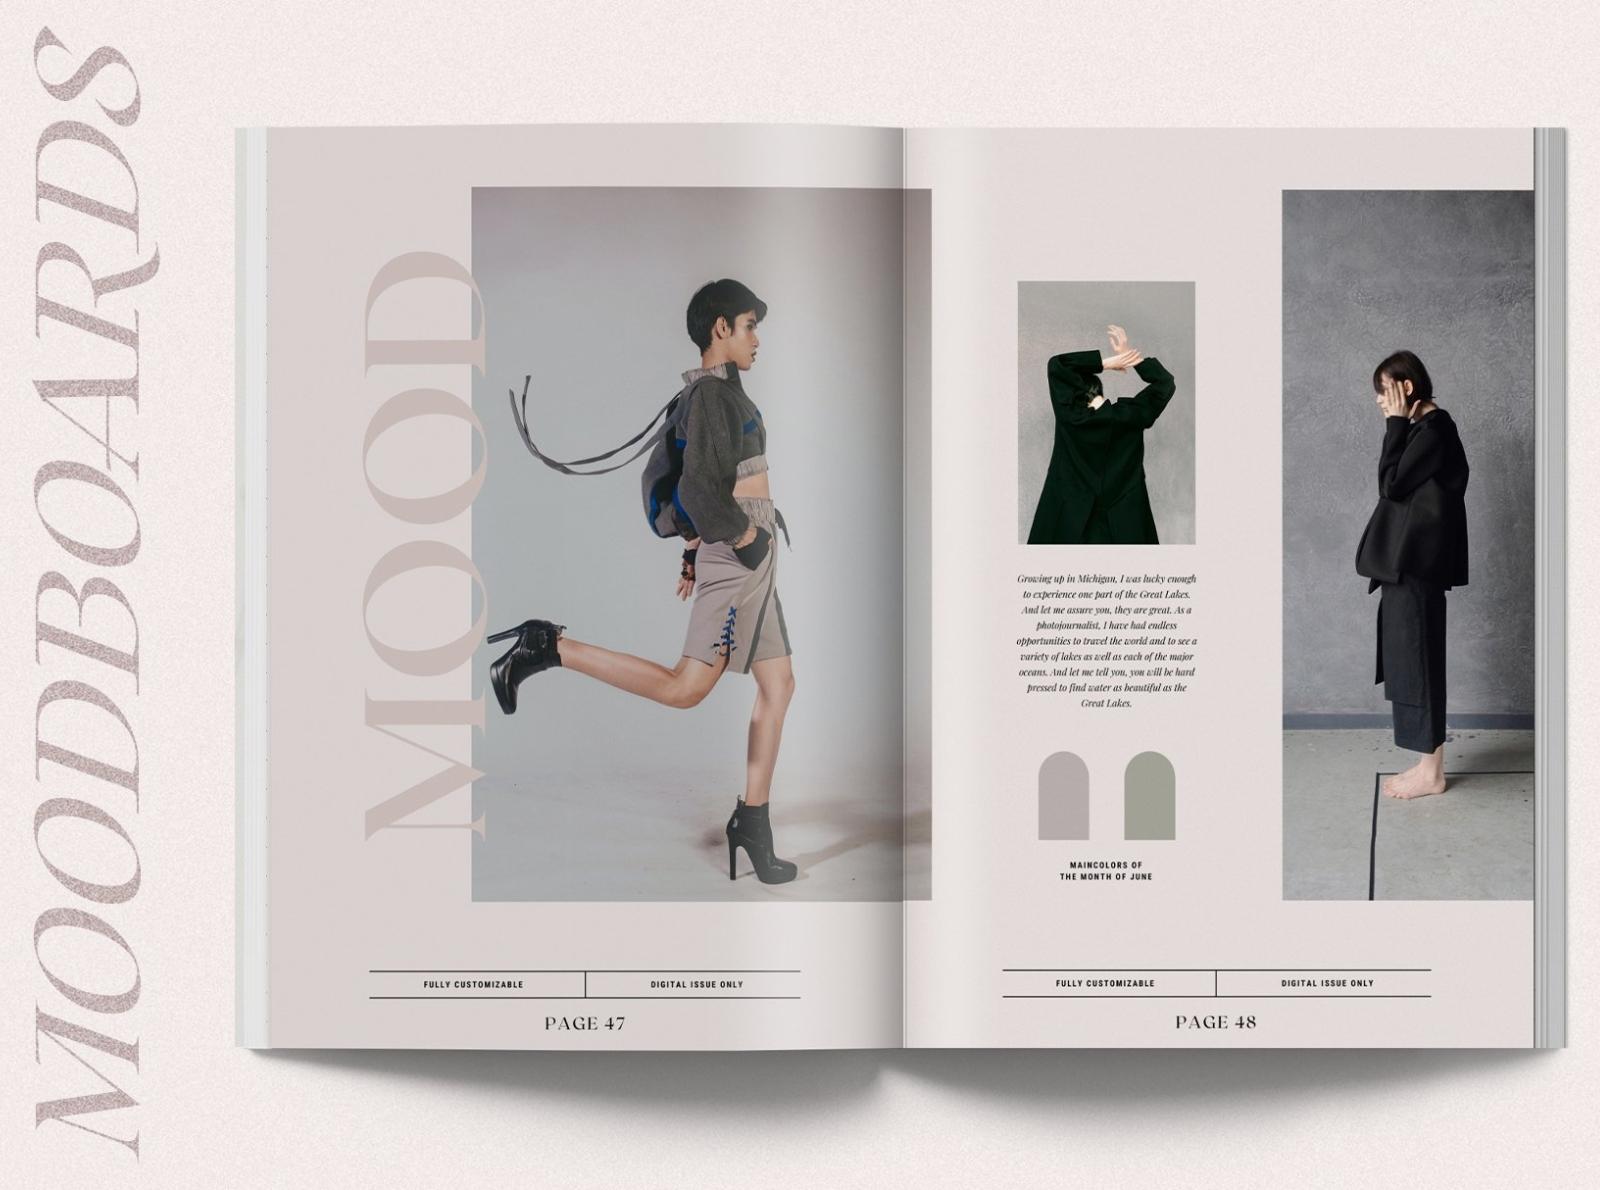 Sophie Canva Ebook Magazine Workbook Creator By Brochure Design On Dribbble